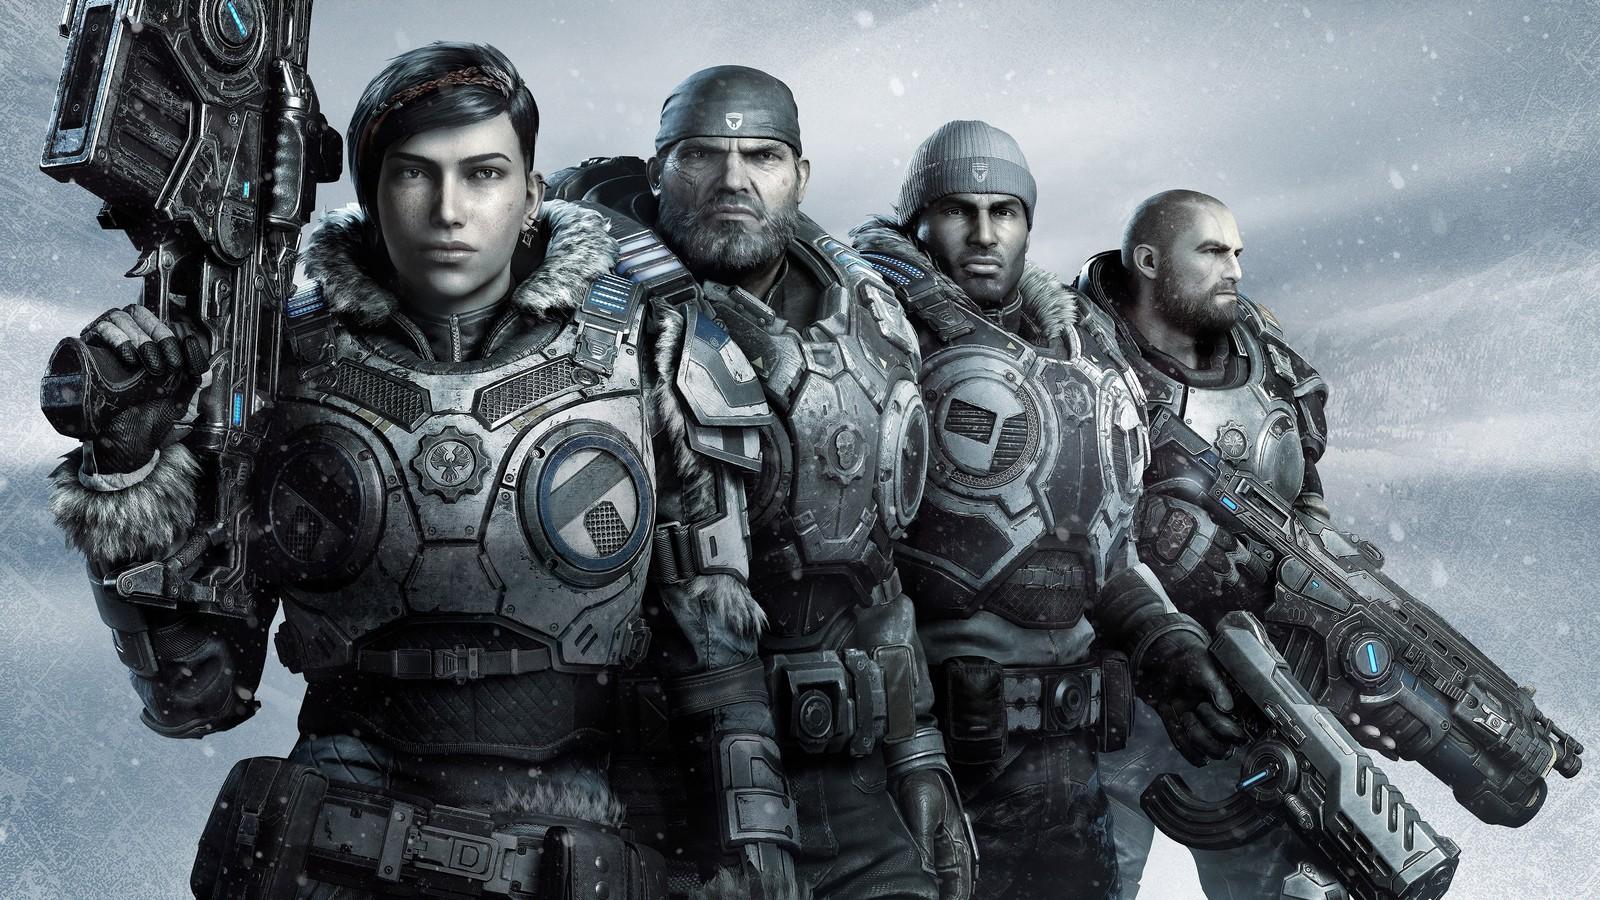 'Gears 5' Director on His Career of Salvaging Game Development Trainwrecks